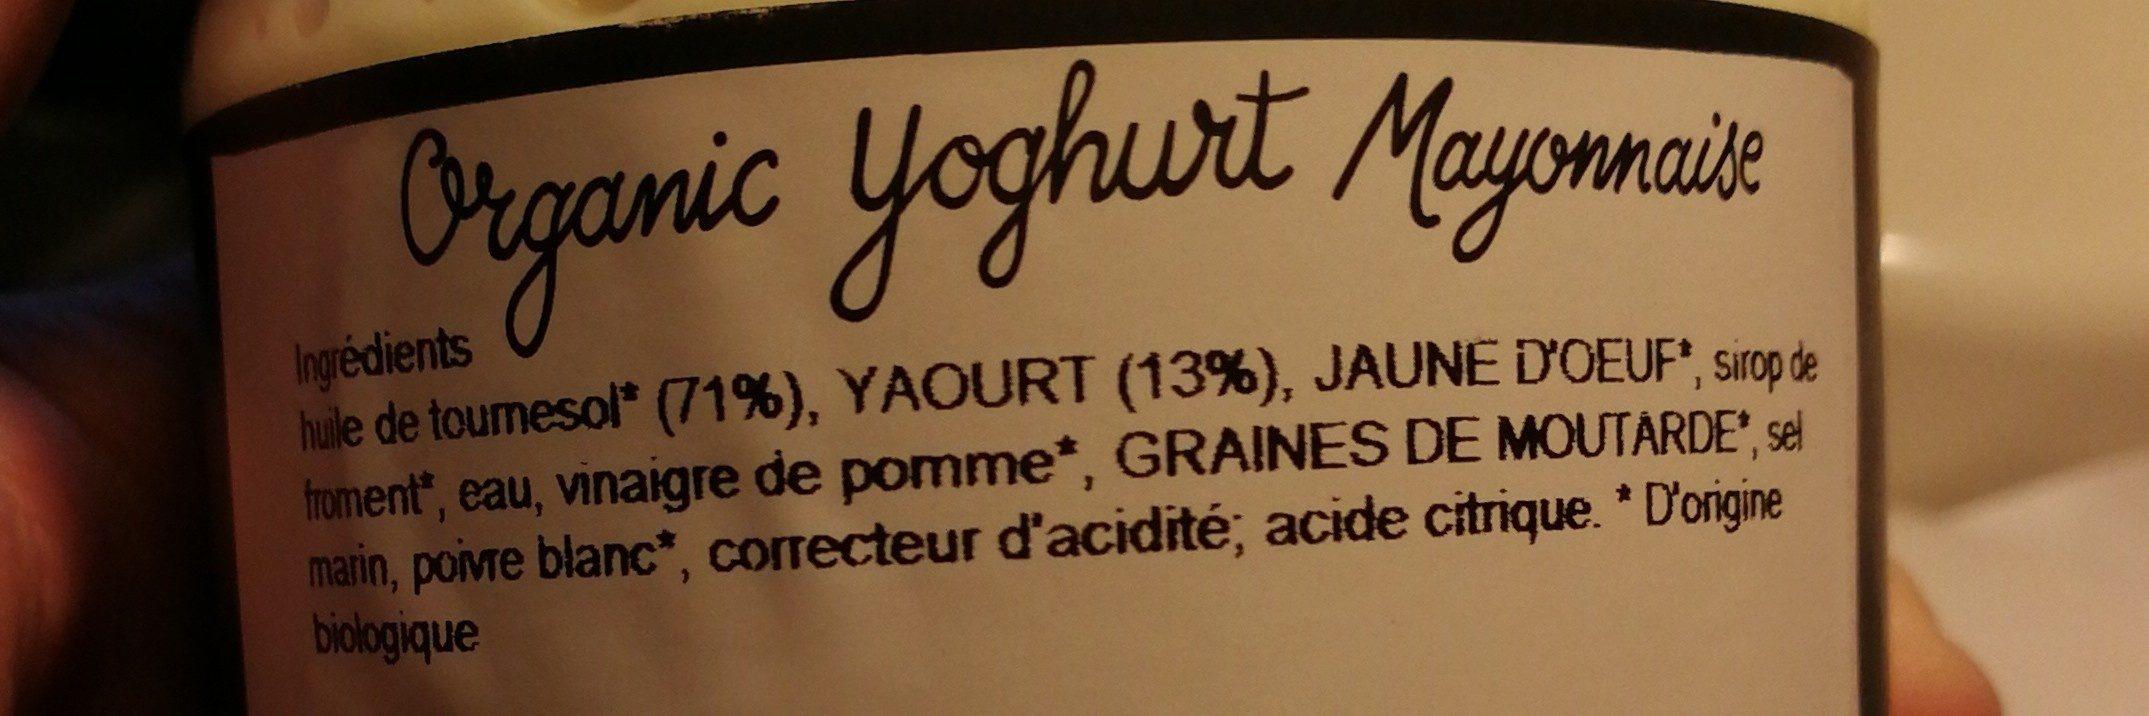 Organic yoghurt mayonnaise - Ingrédients - fr